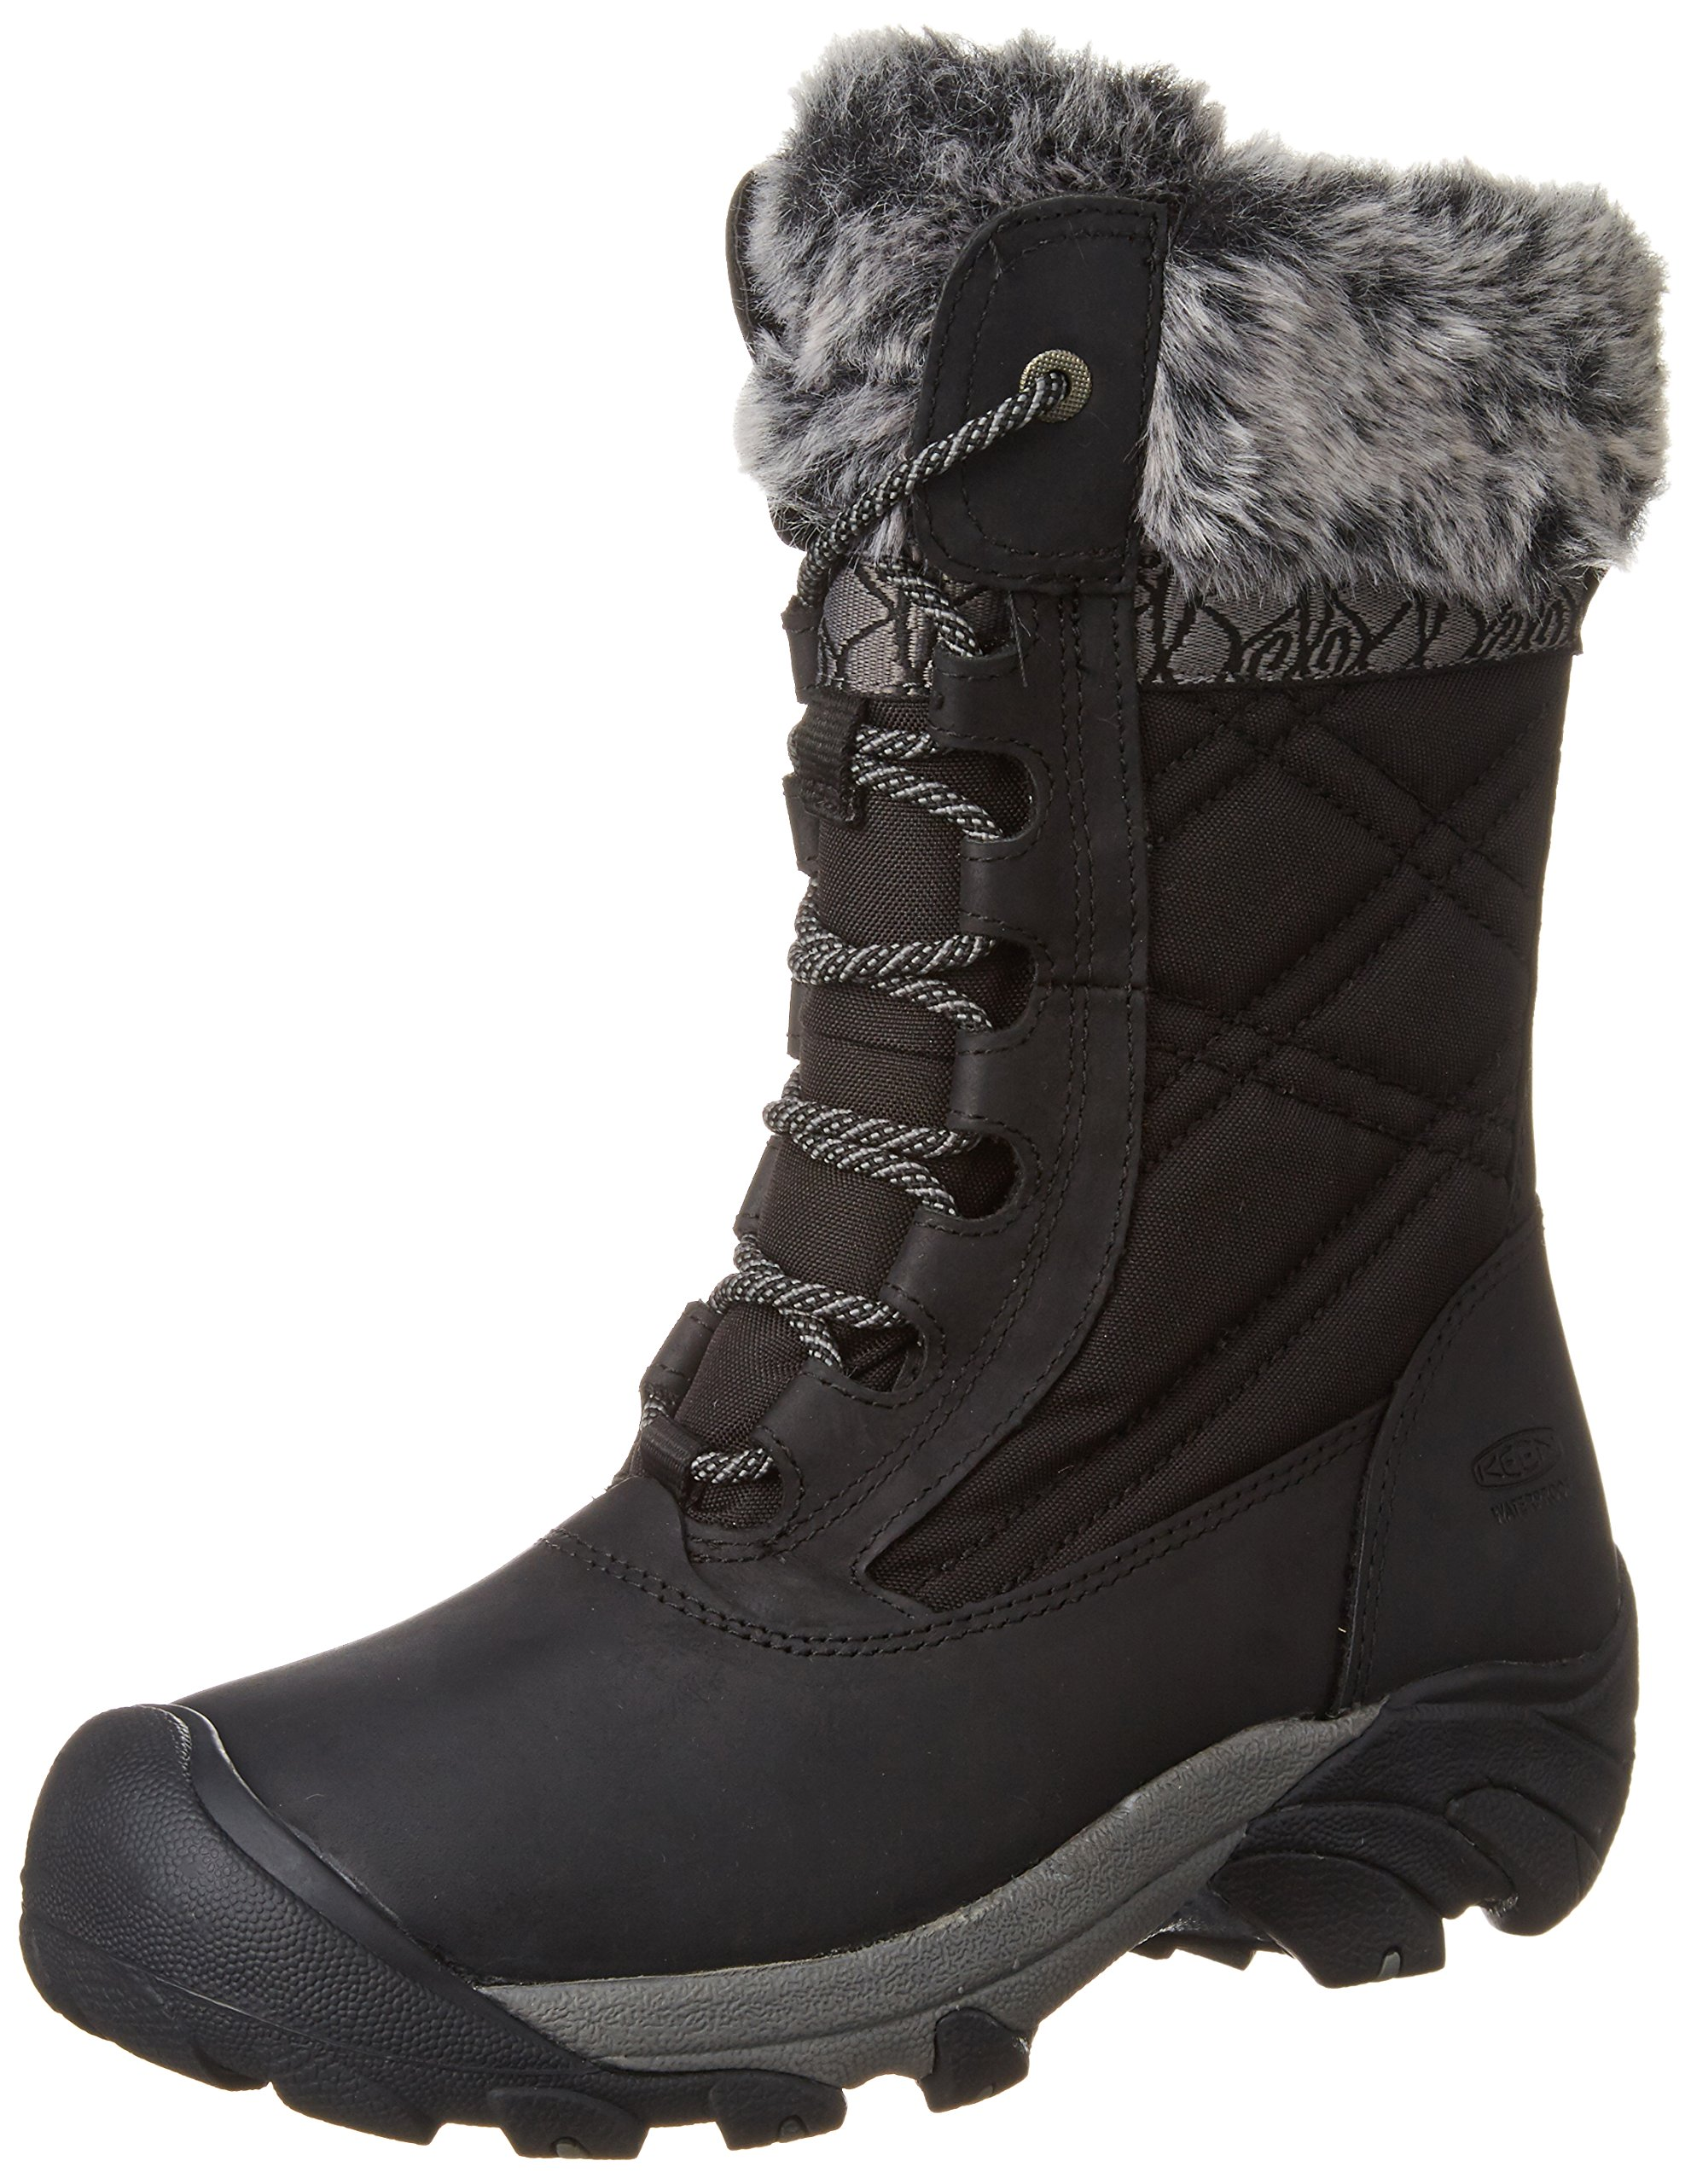 KEEN Women's Hoodoo III Winter Boot, Black/Gargoyle, 9 M US